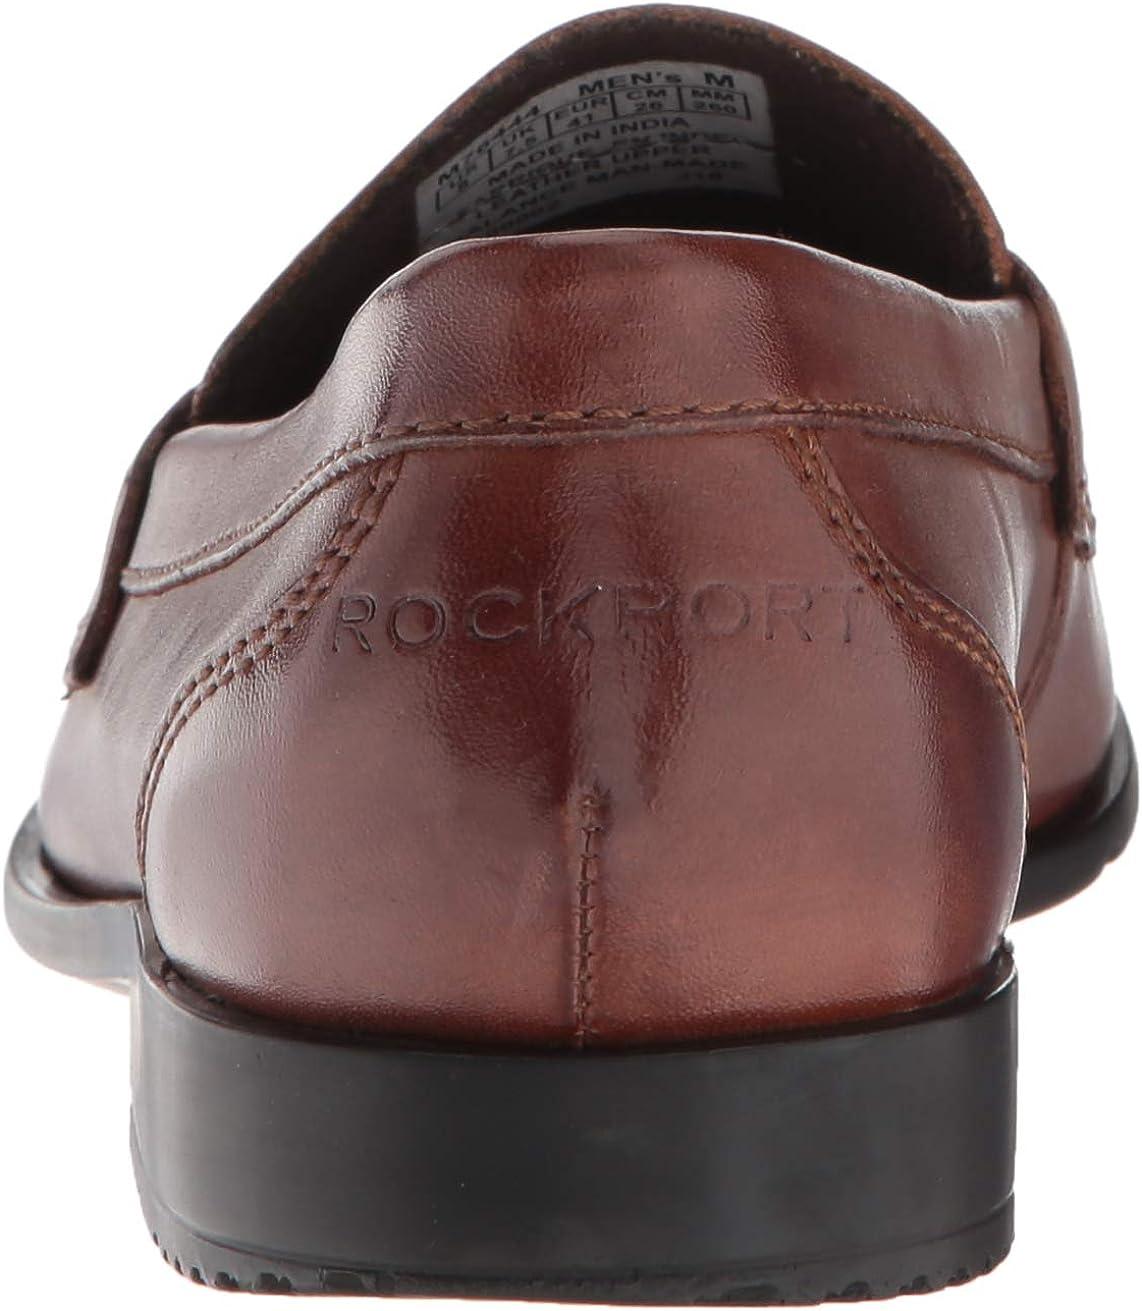 Rockport Mens Classic Lite Penny Loafer